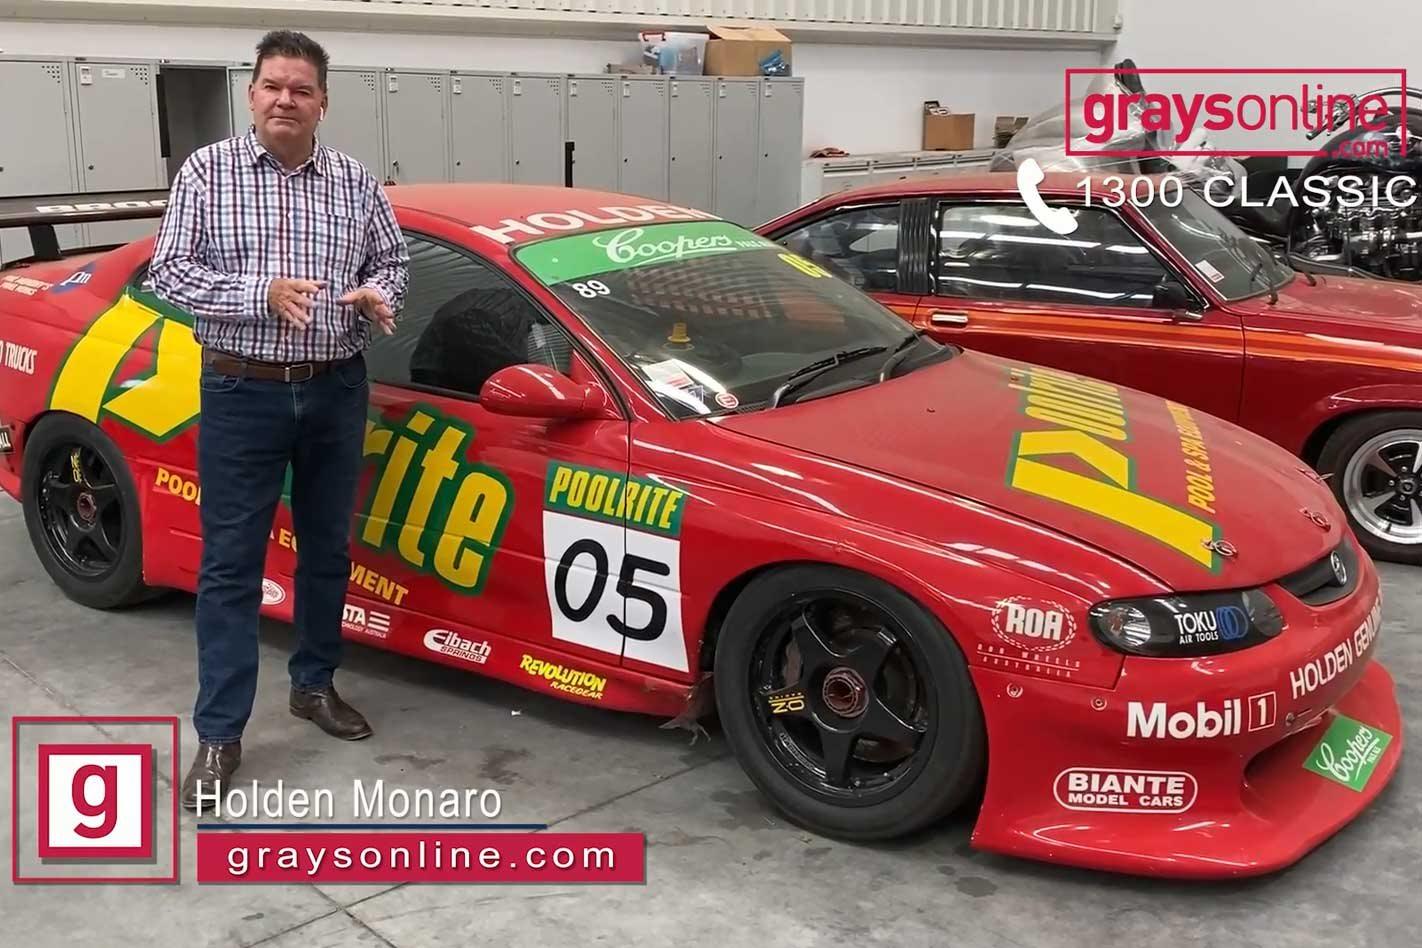 Peter Brock's 2003 Nation's Cup Holden Monaro set to go under the hammer